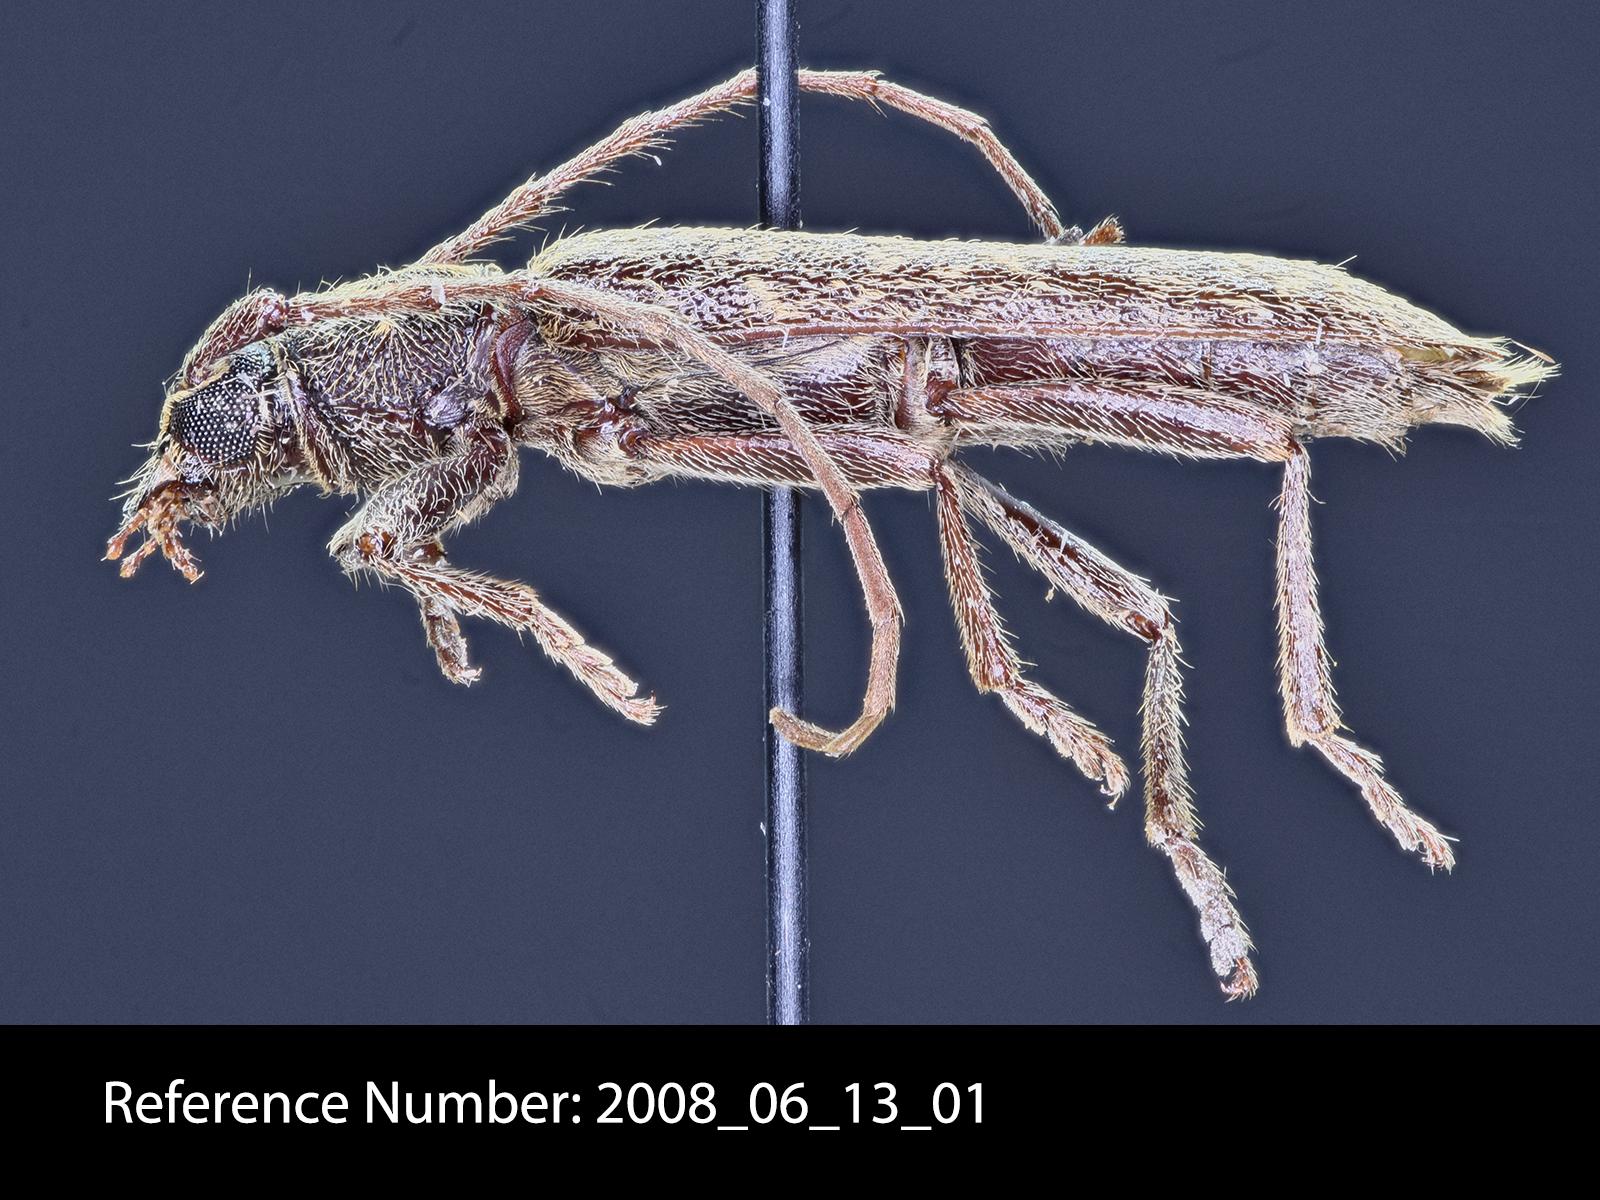 Anelaphus villosus lateral view